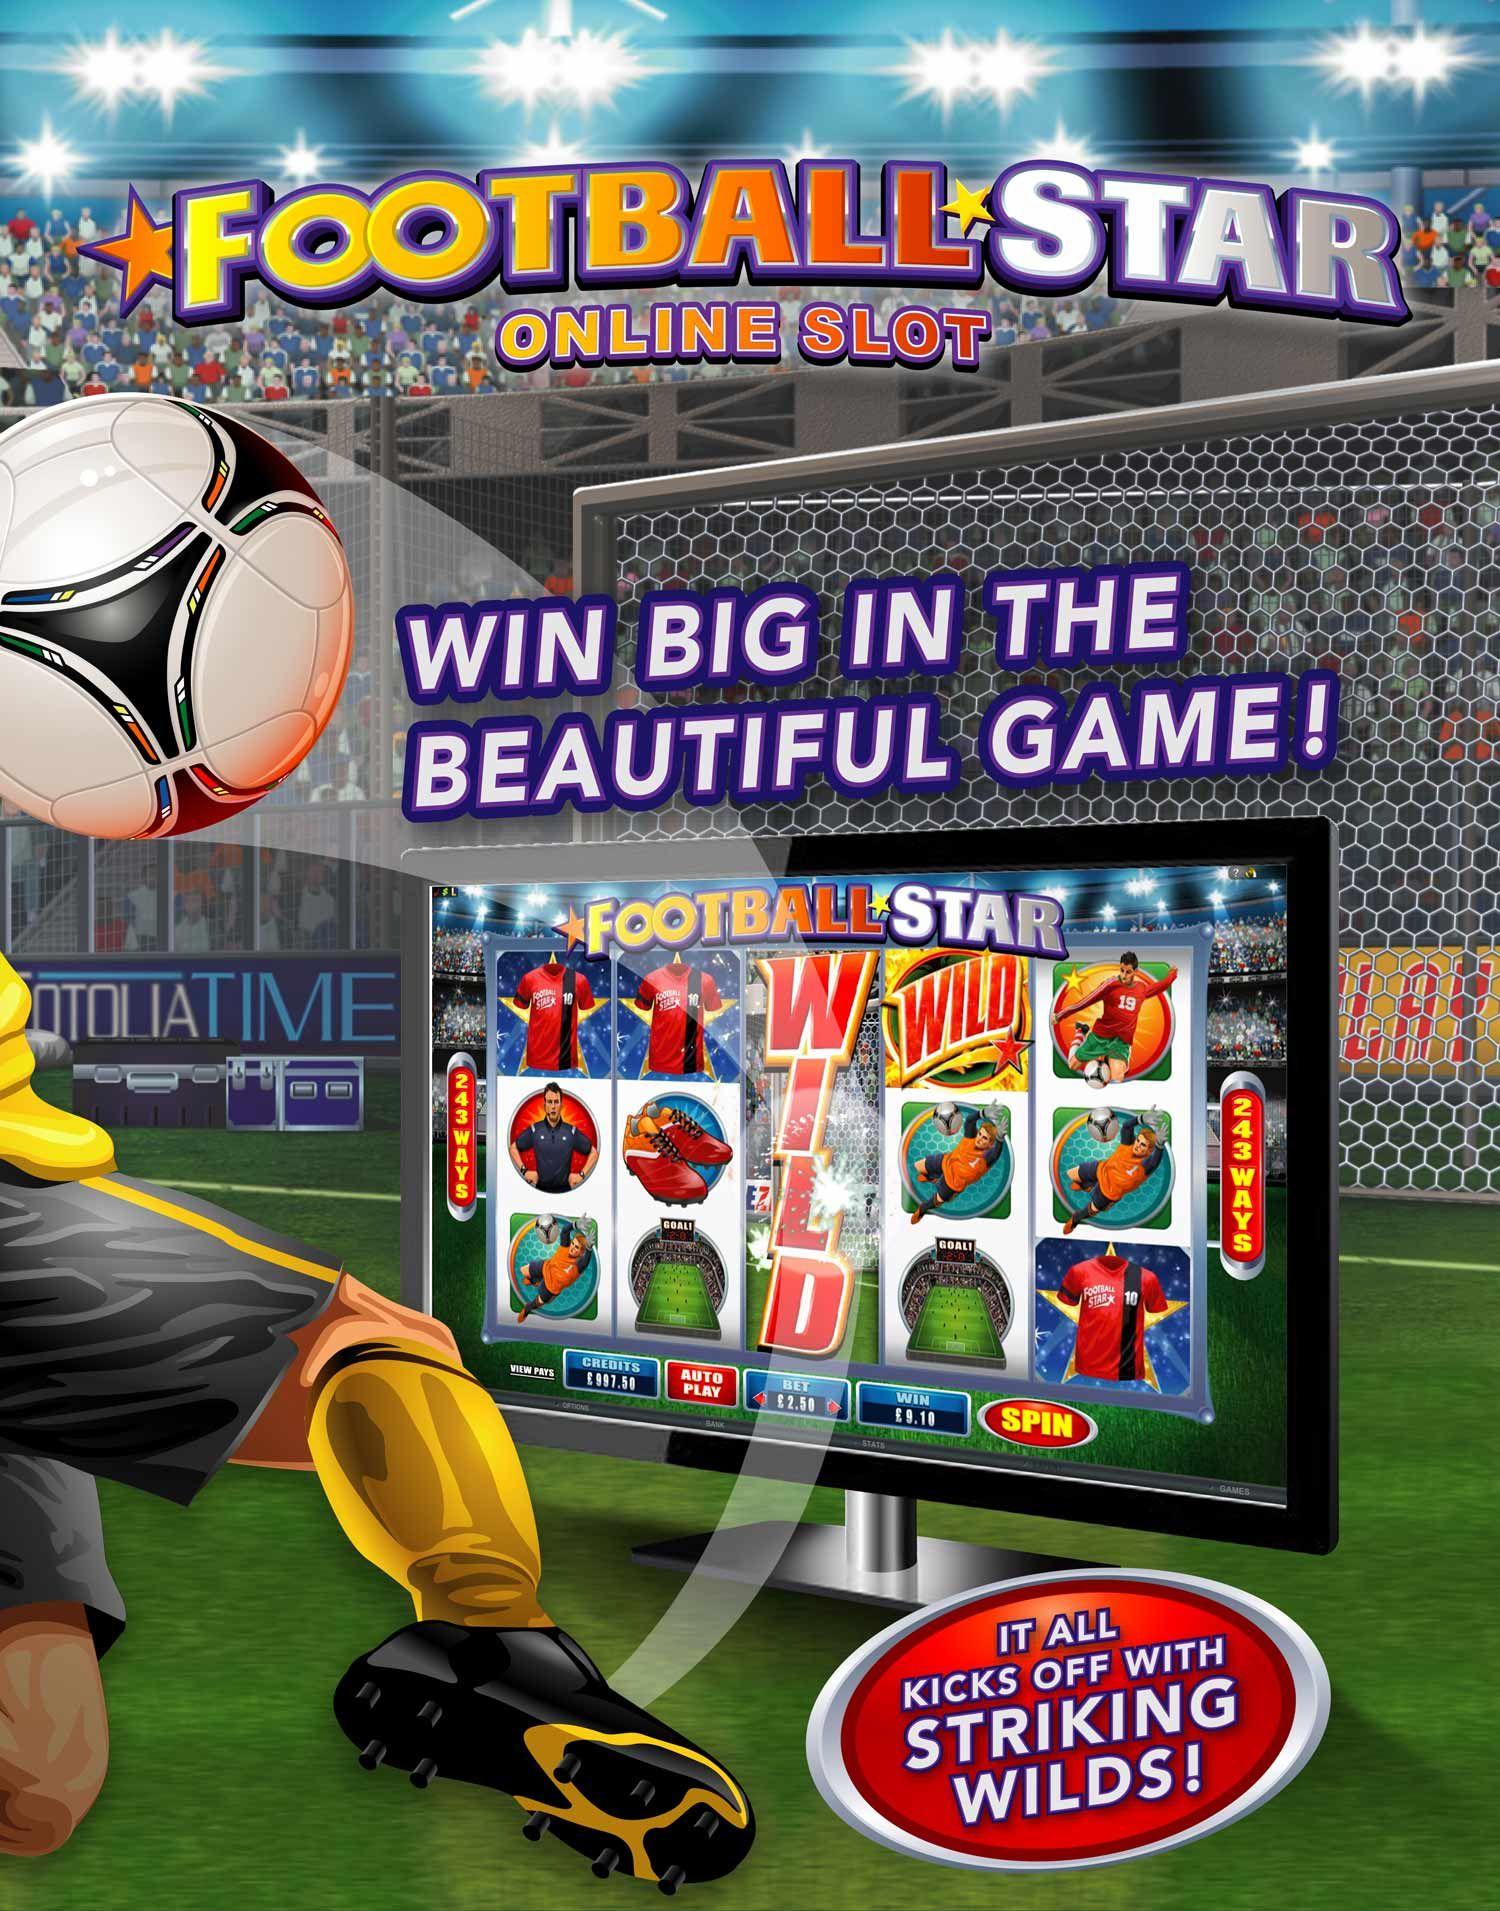 покер игры онлайн футбол